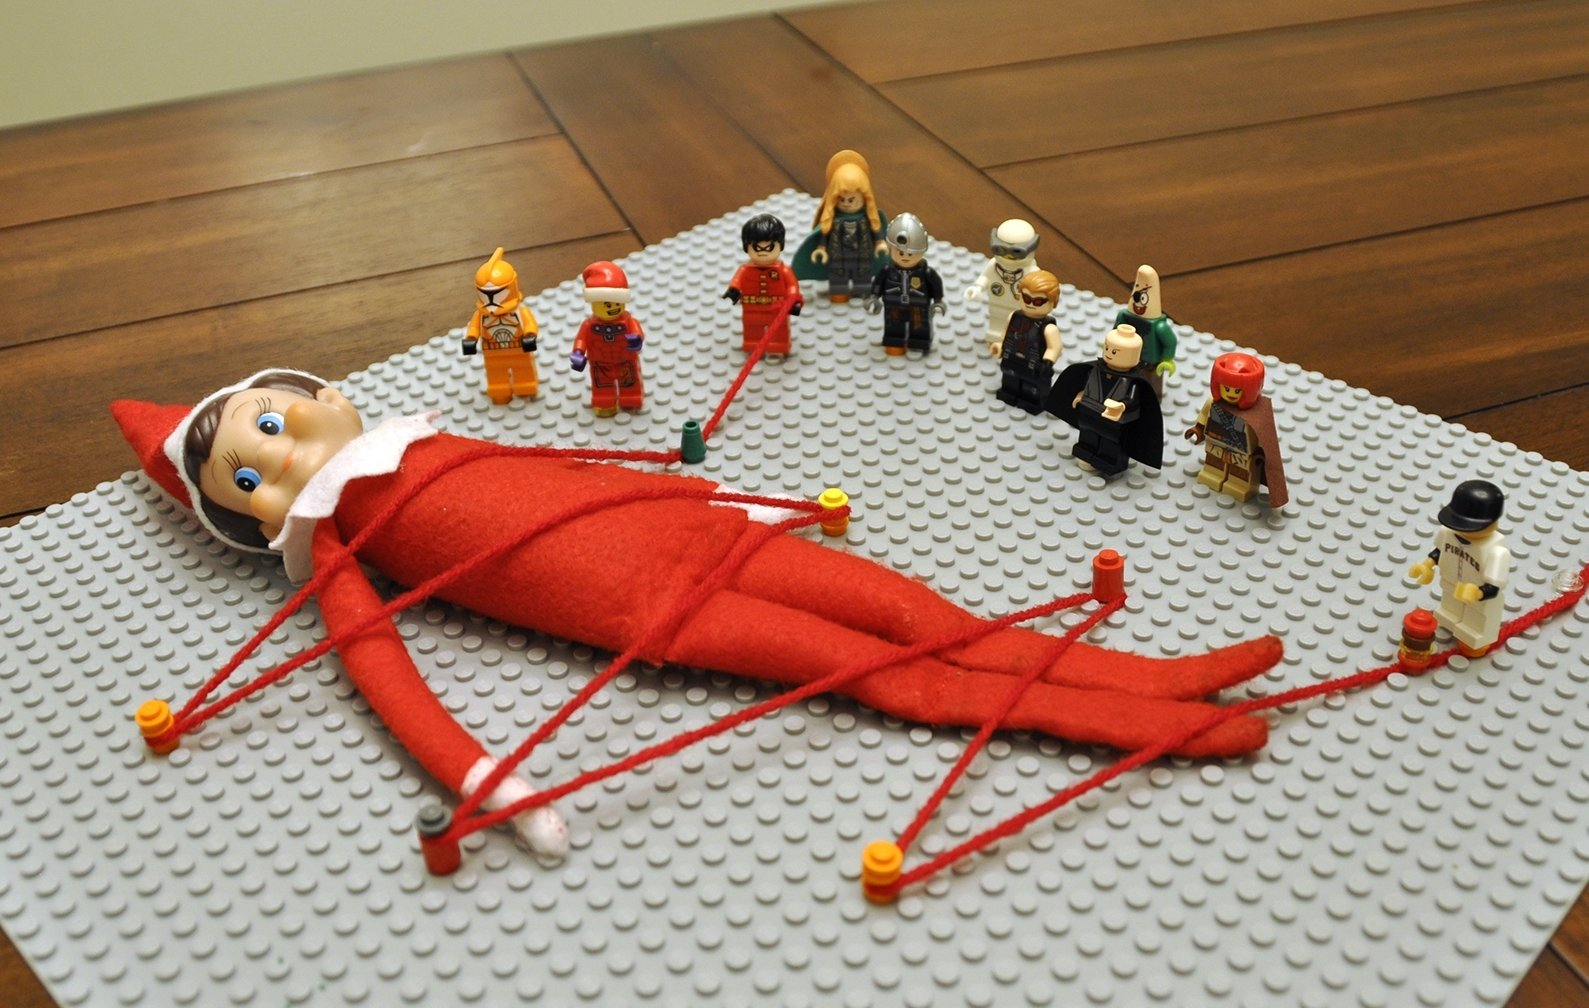 10 Most Popular Best Elf On A Shelf Ideas 32 genius elf on the shelf ideas party delights blog 2020